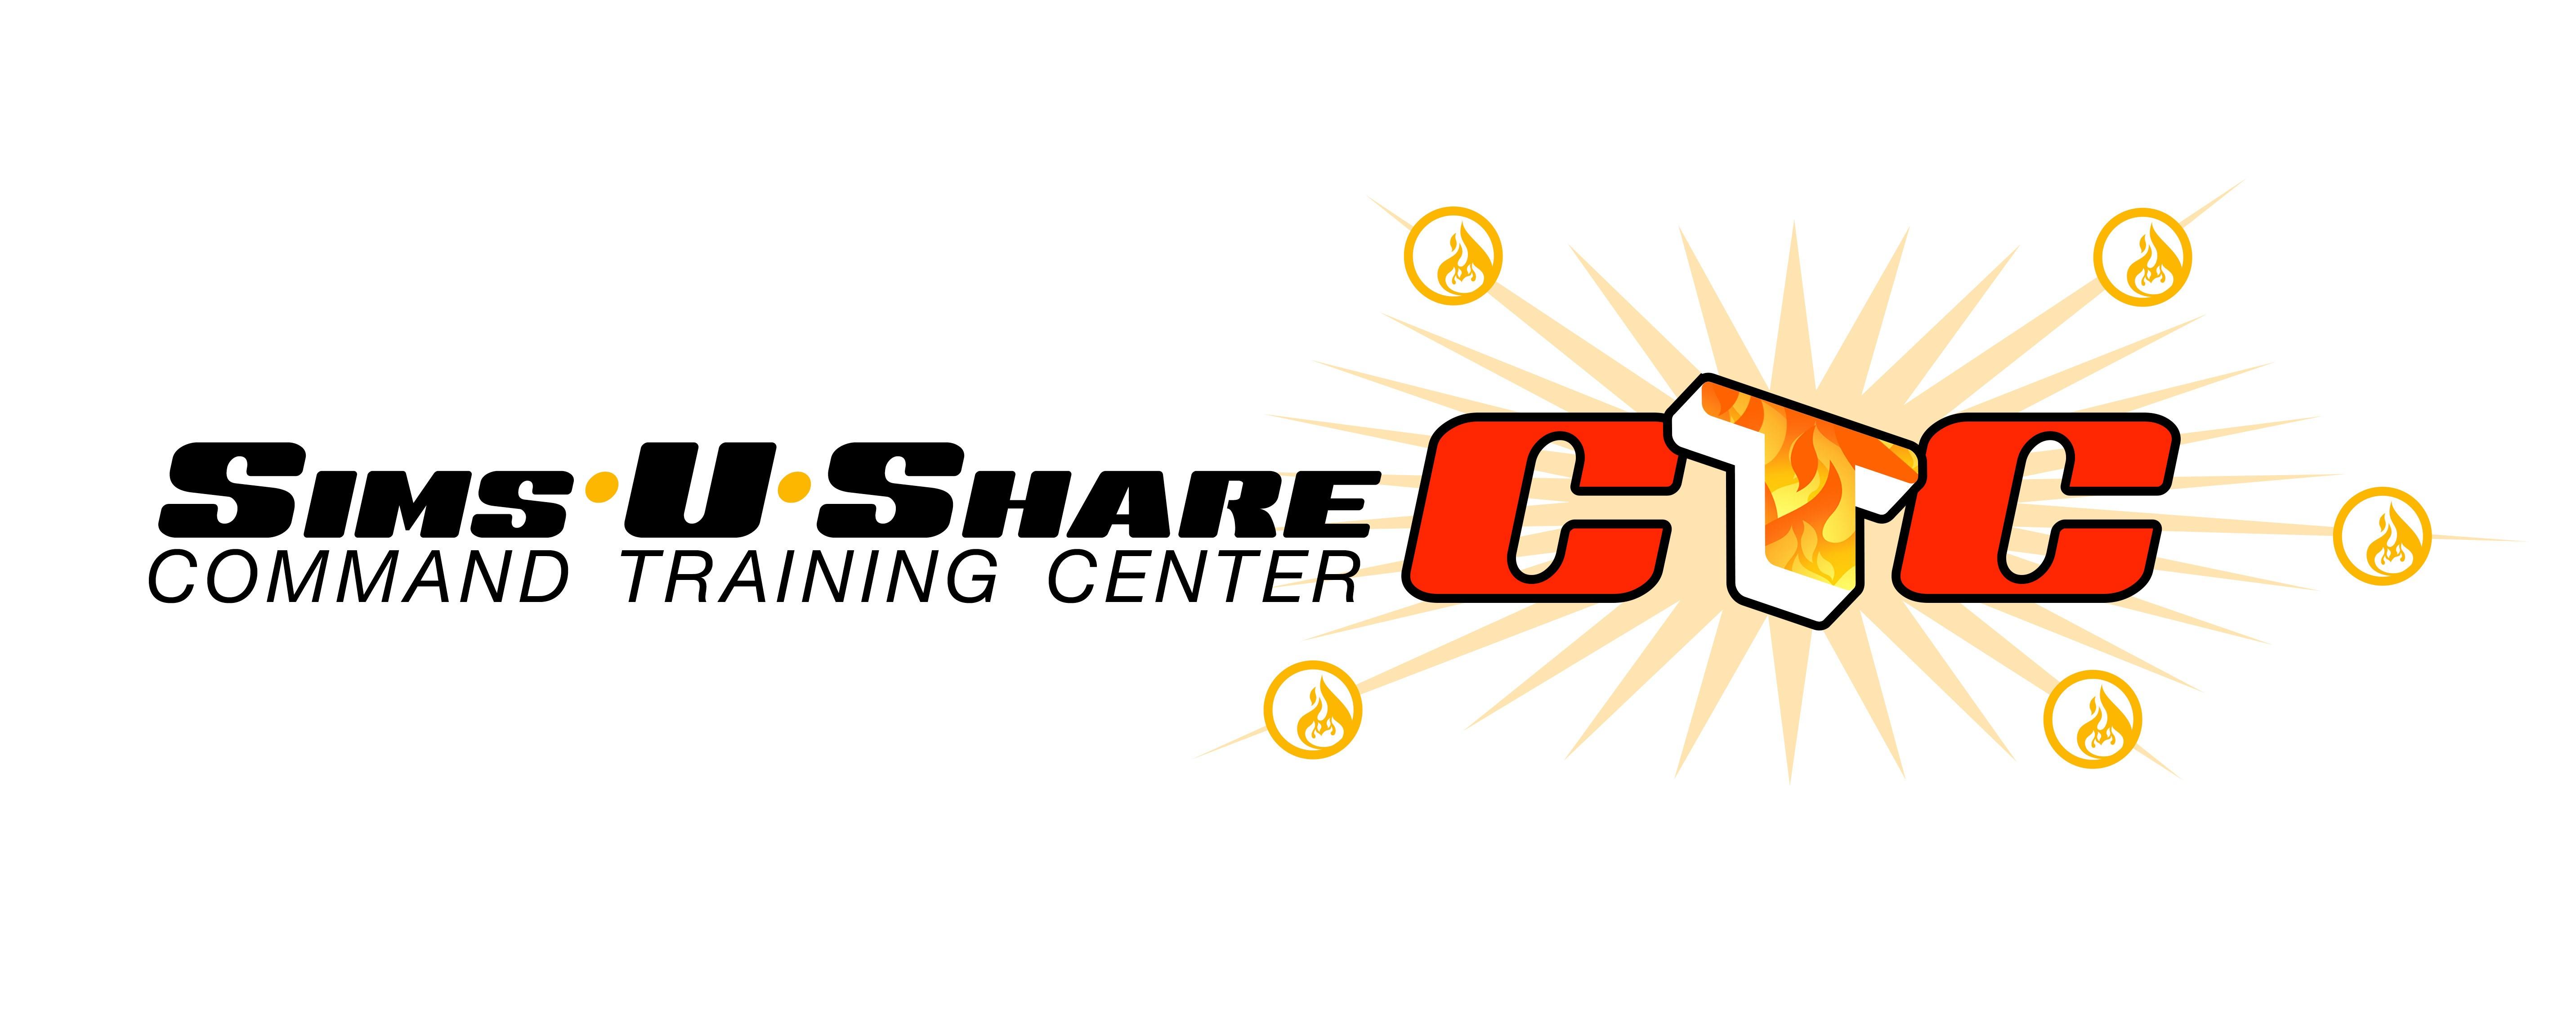 SimsUshare CTC Operator I